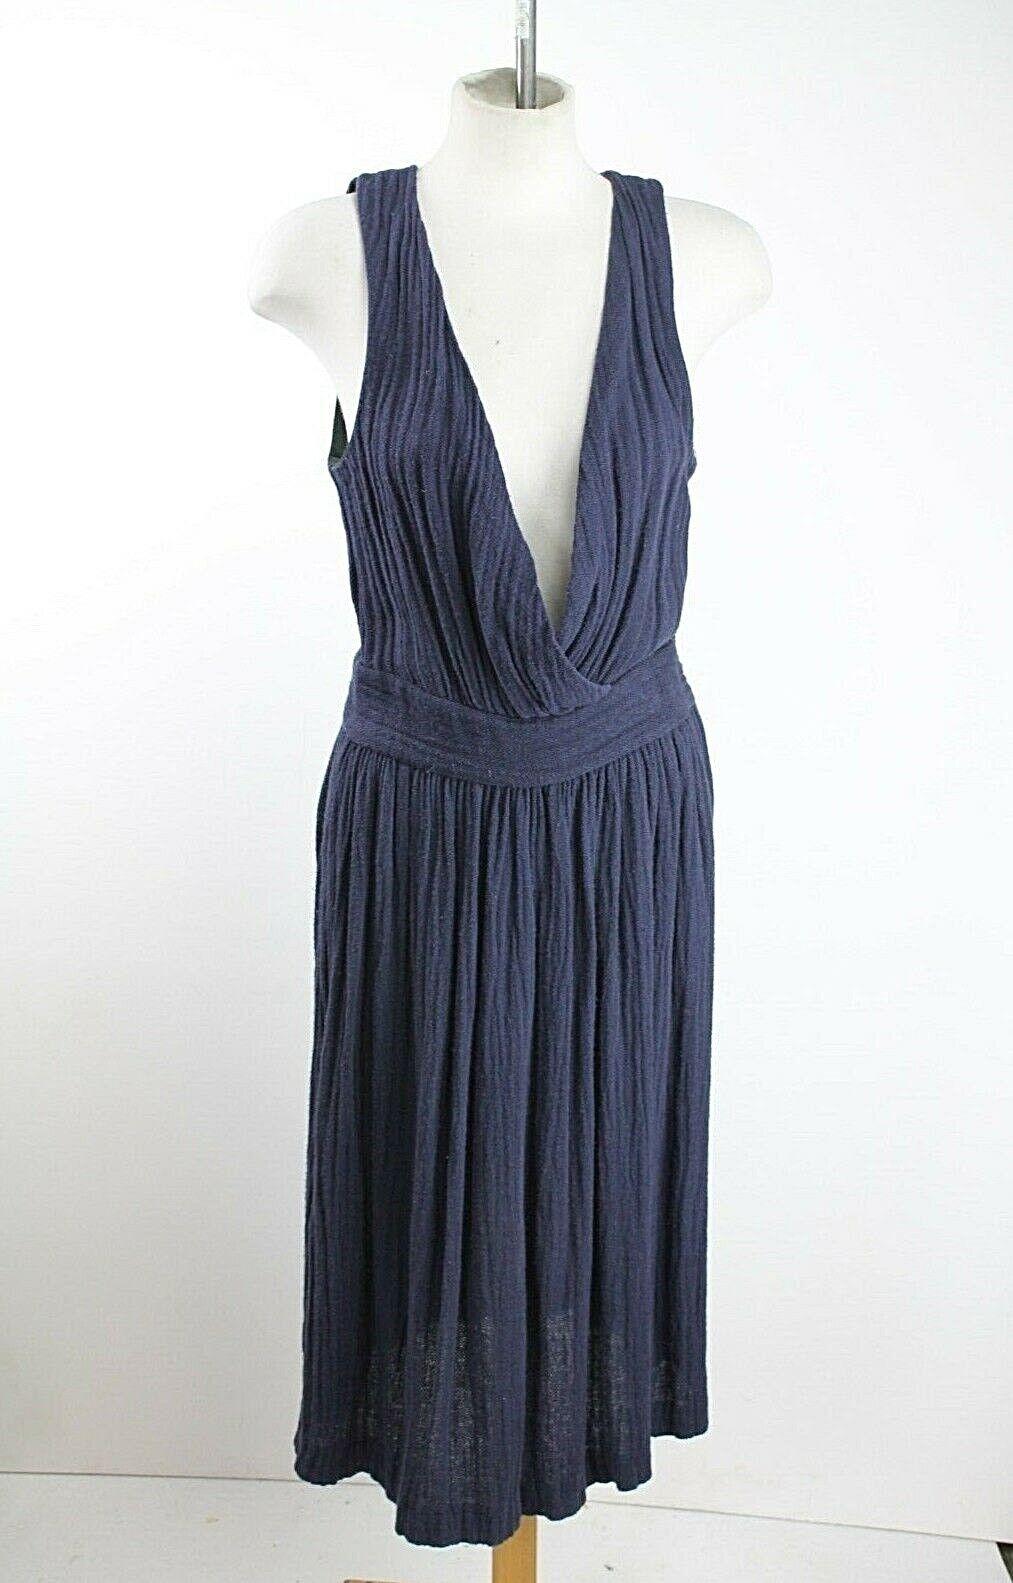 Isabel Marant Blau Leinenkleid ,Größe Uk6   Eu 34